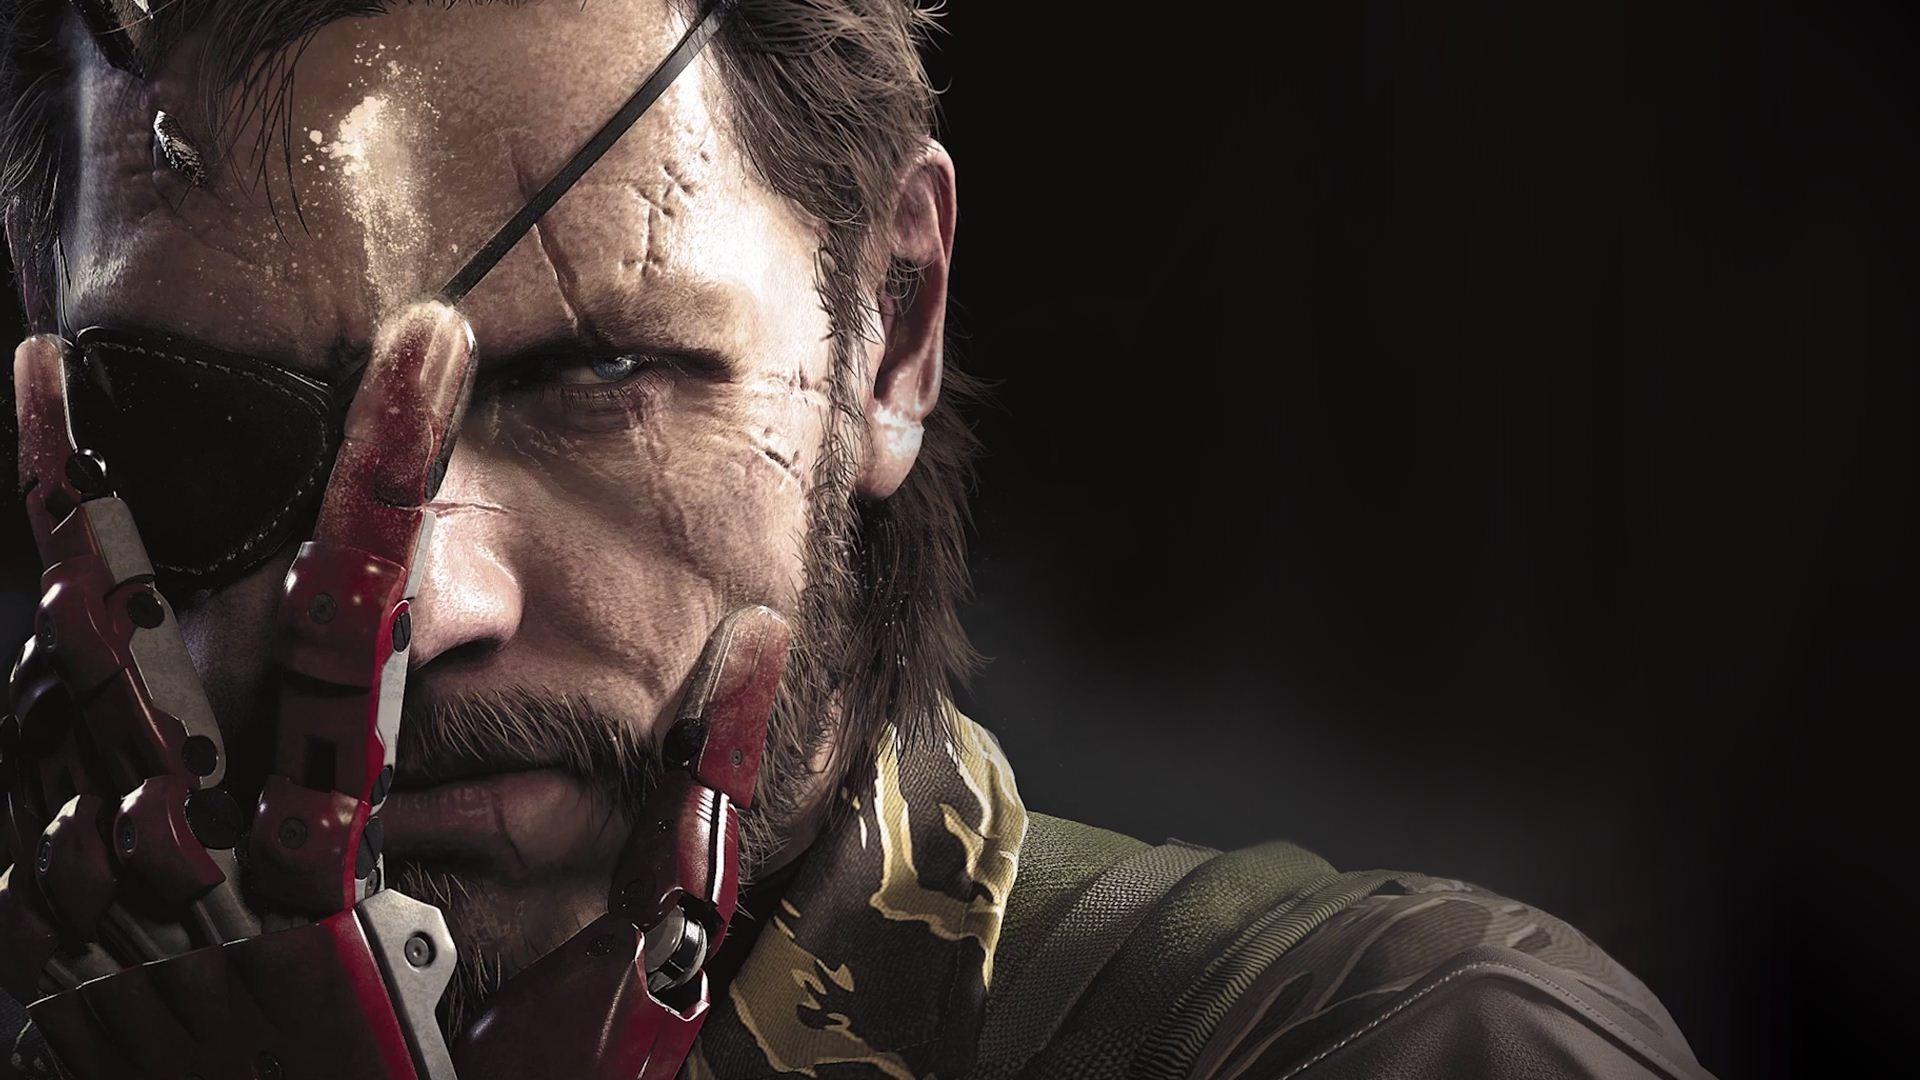 … Metal Gear Solid 5: The Phantom Pain Wallpaper …